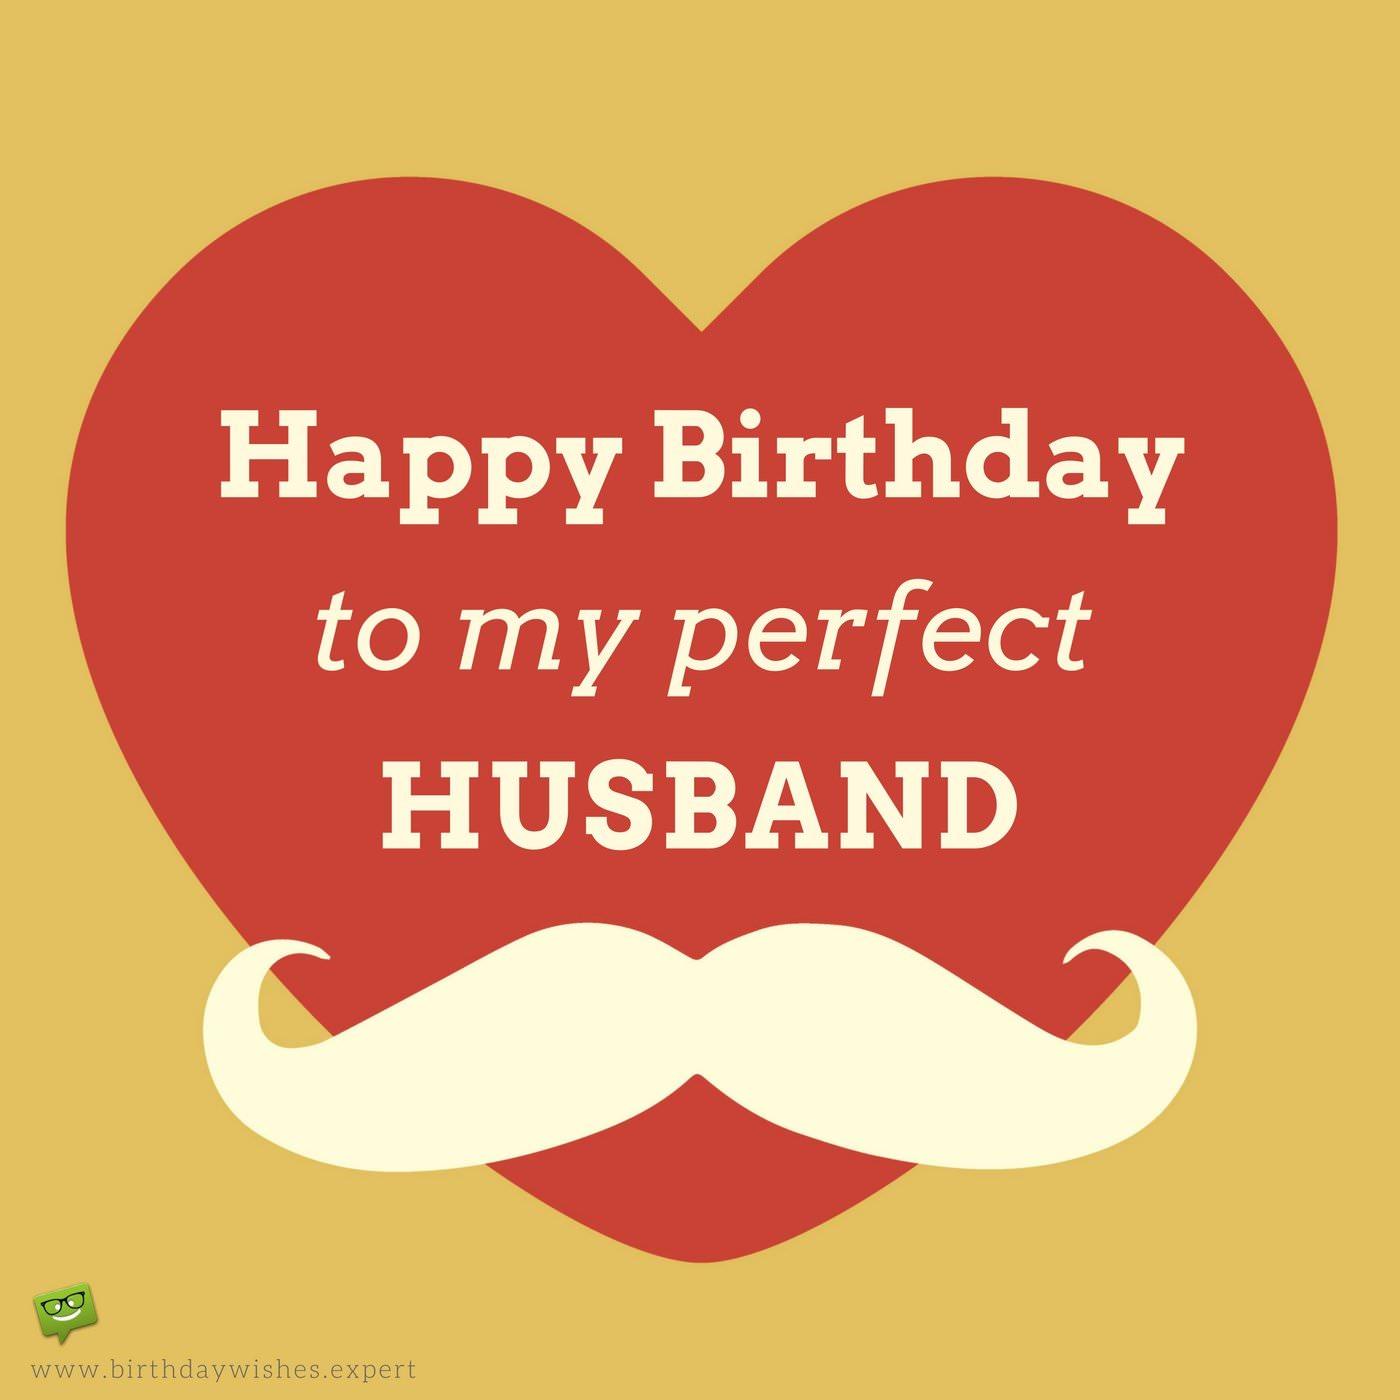 To My Perfect Husband Husband Birthday Wishes